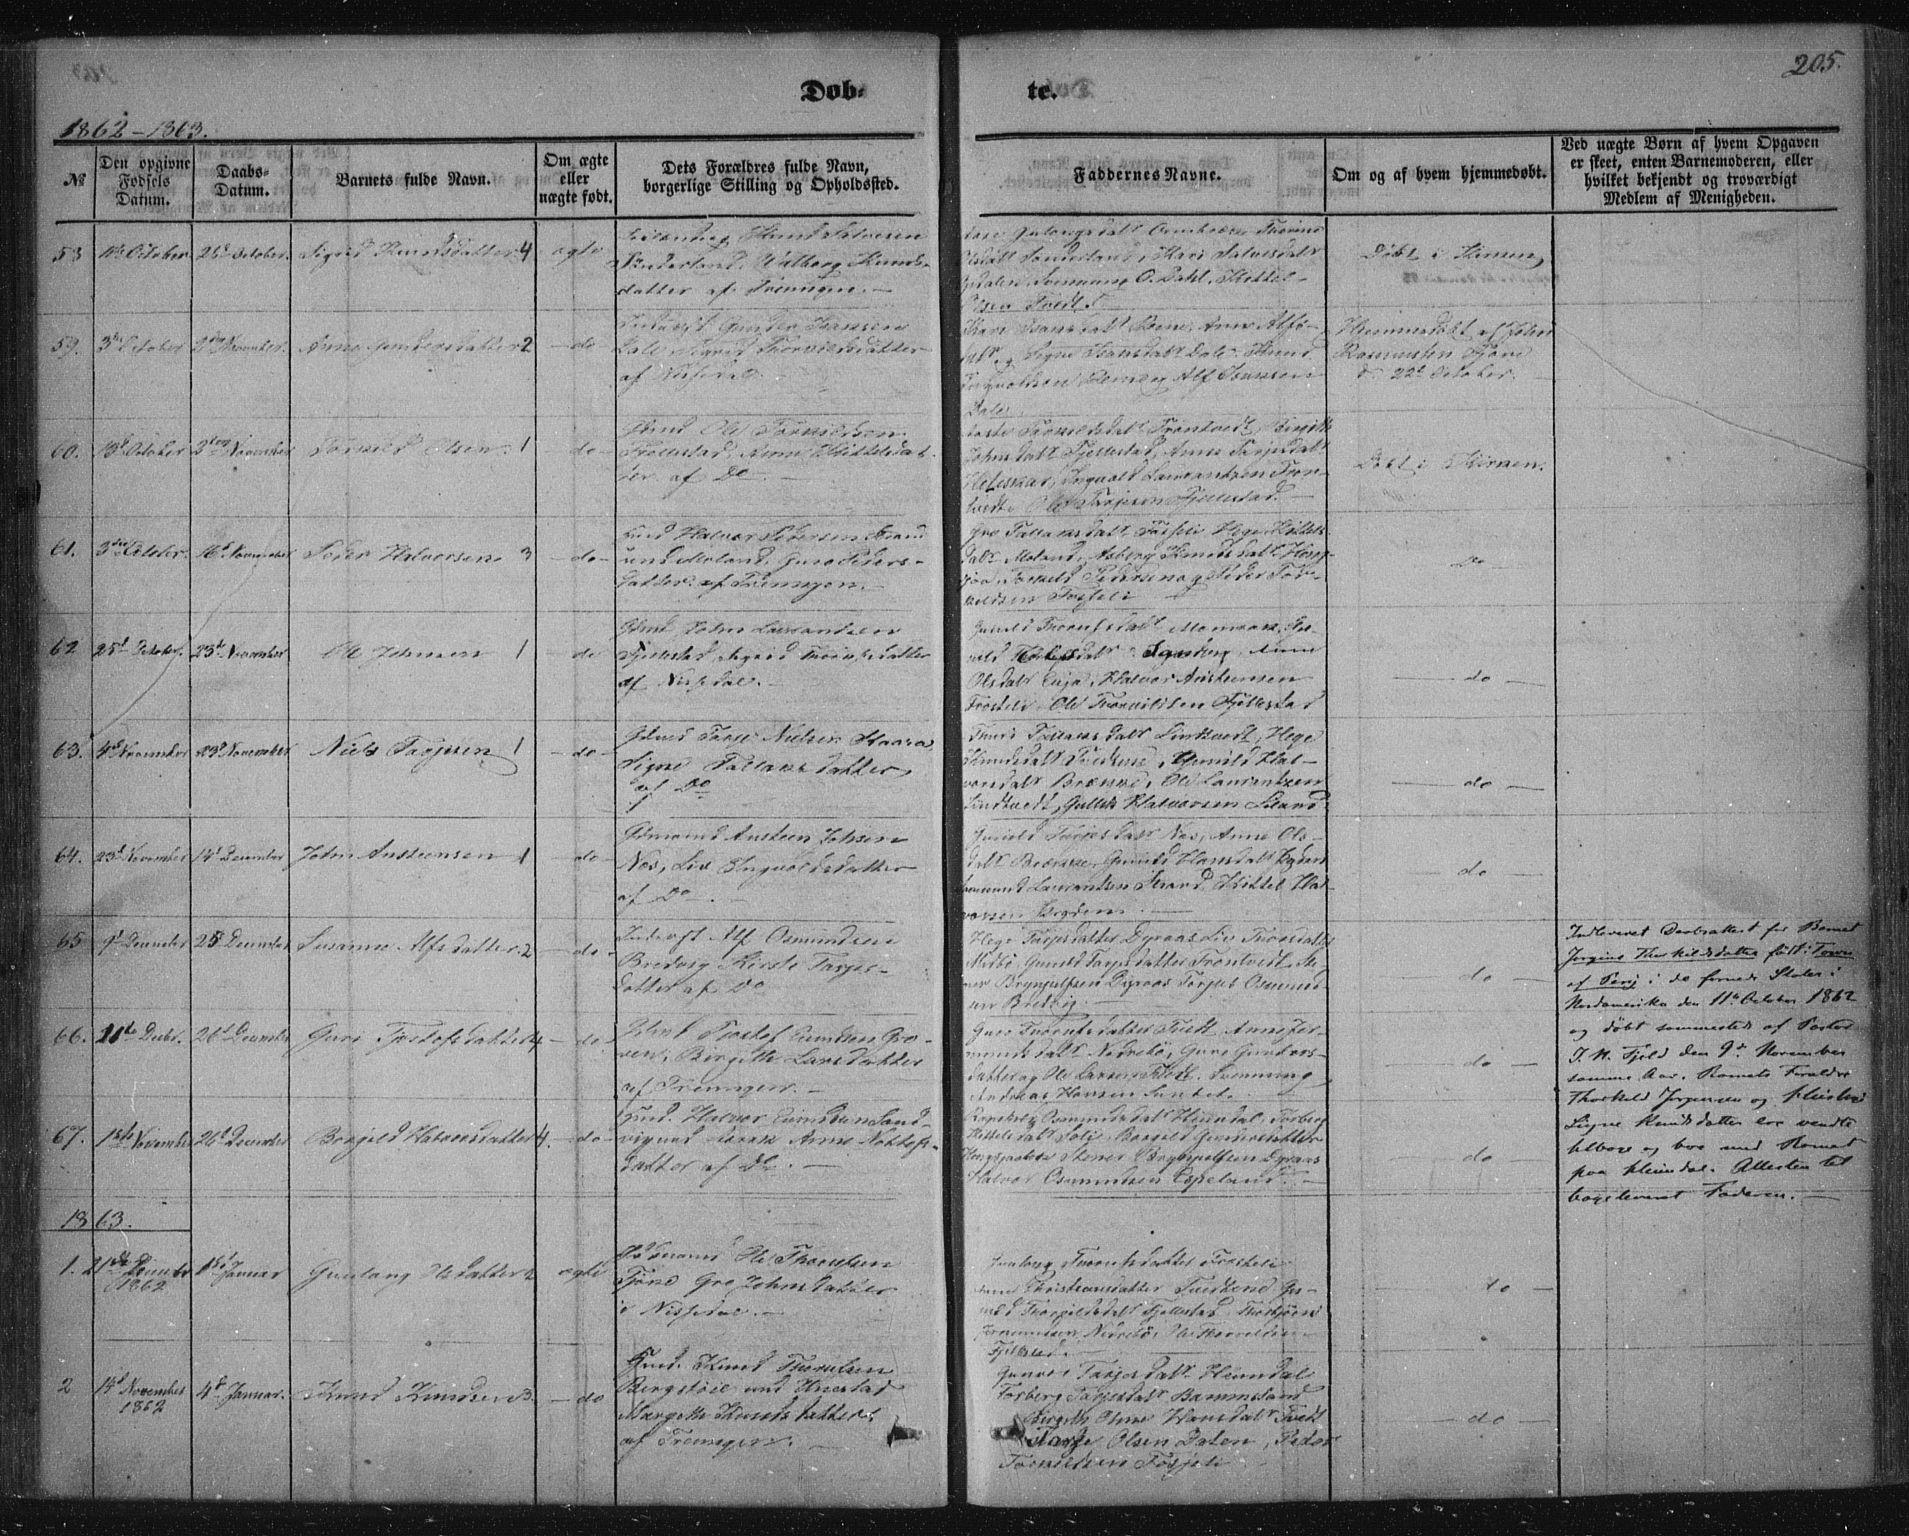 SAKO, Nissedal kirkebøker, F/Fa/L0003: Ministerialbok nr. I 3, 1846-1870, s. 204-205